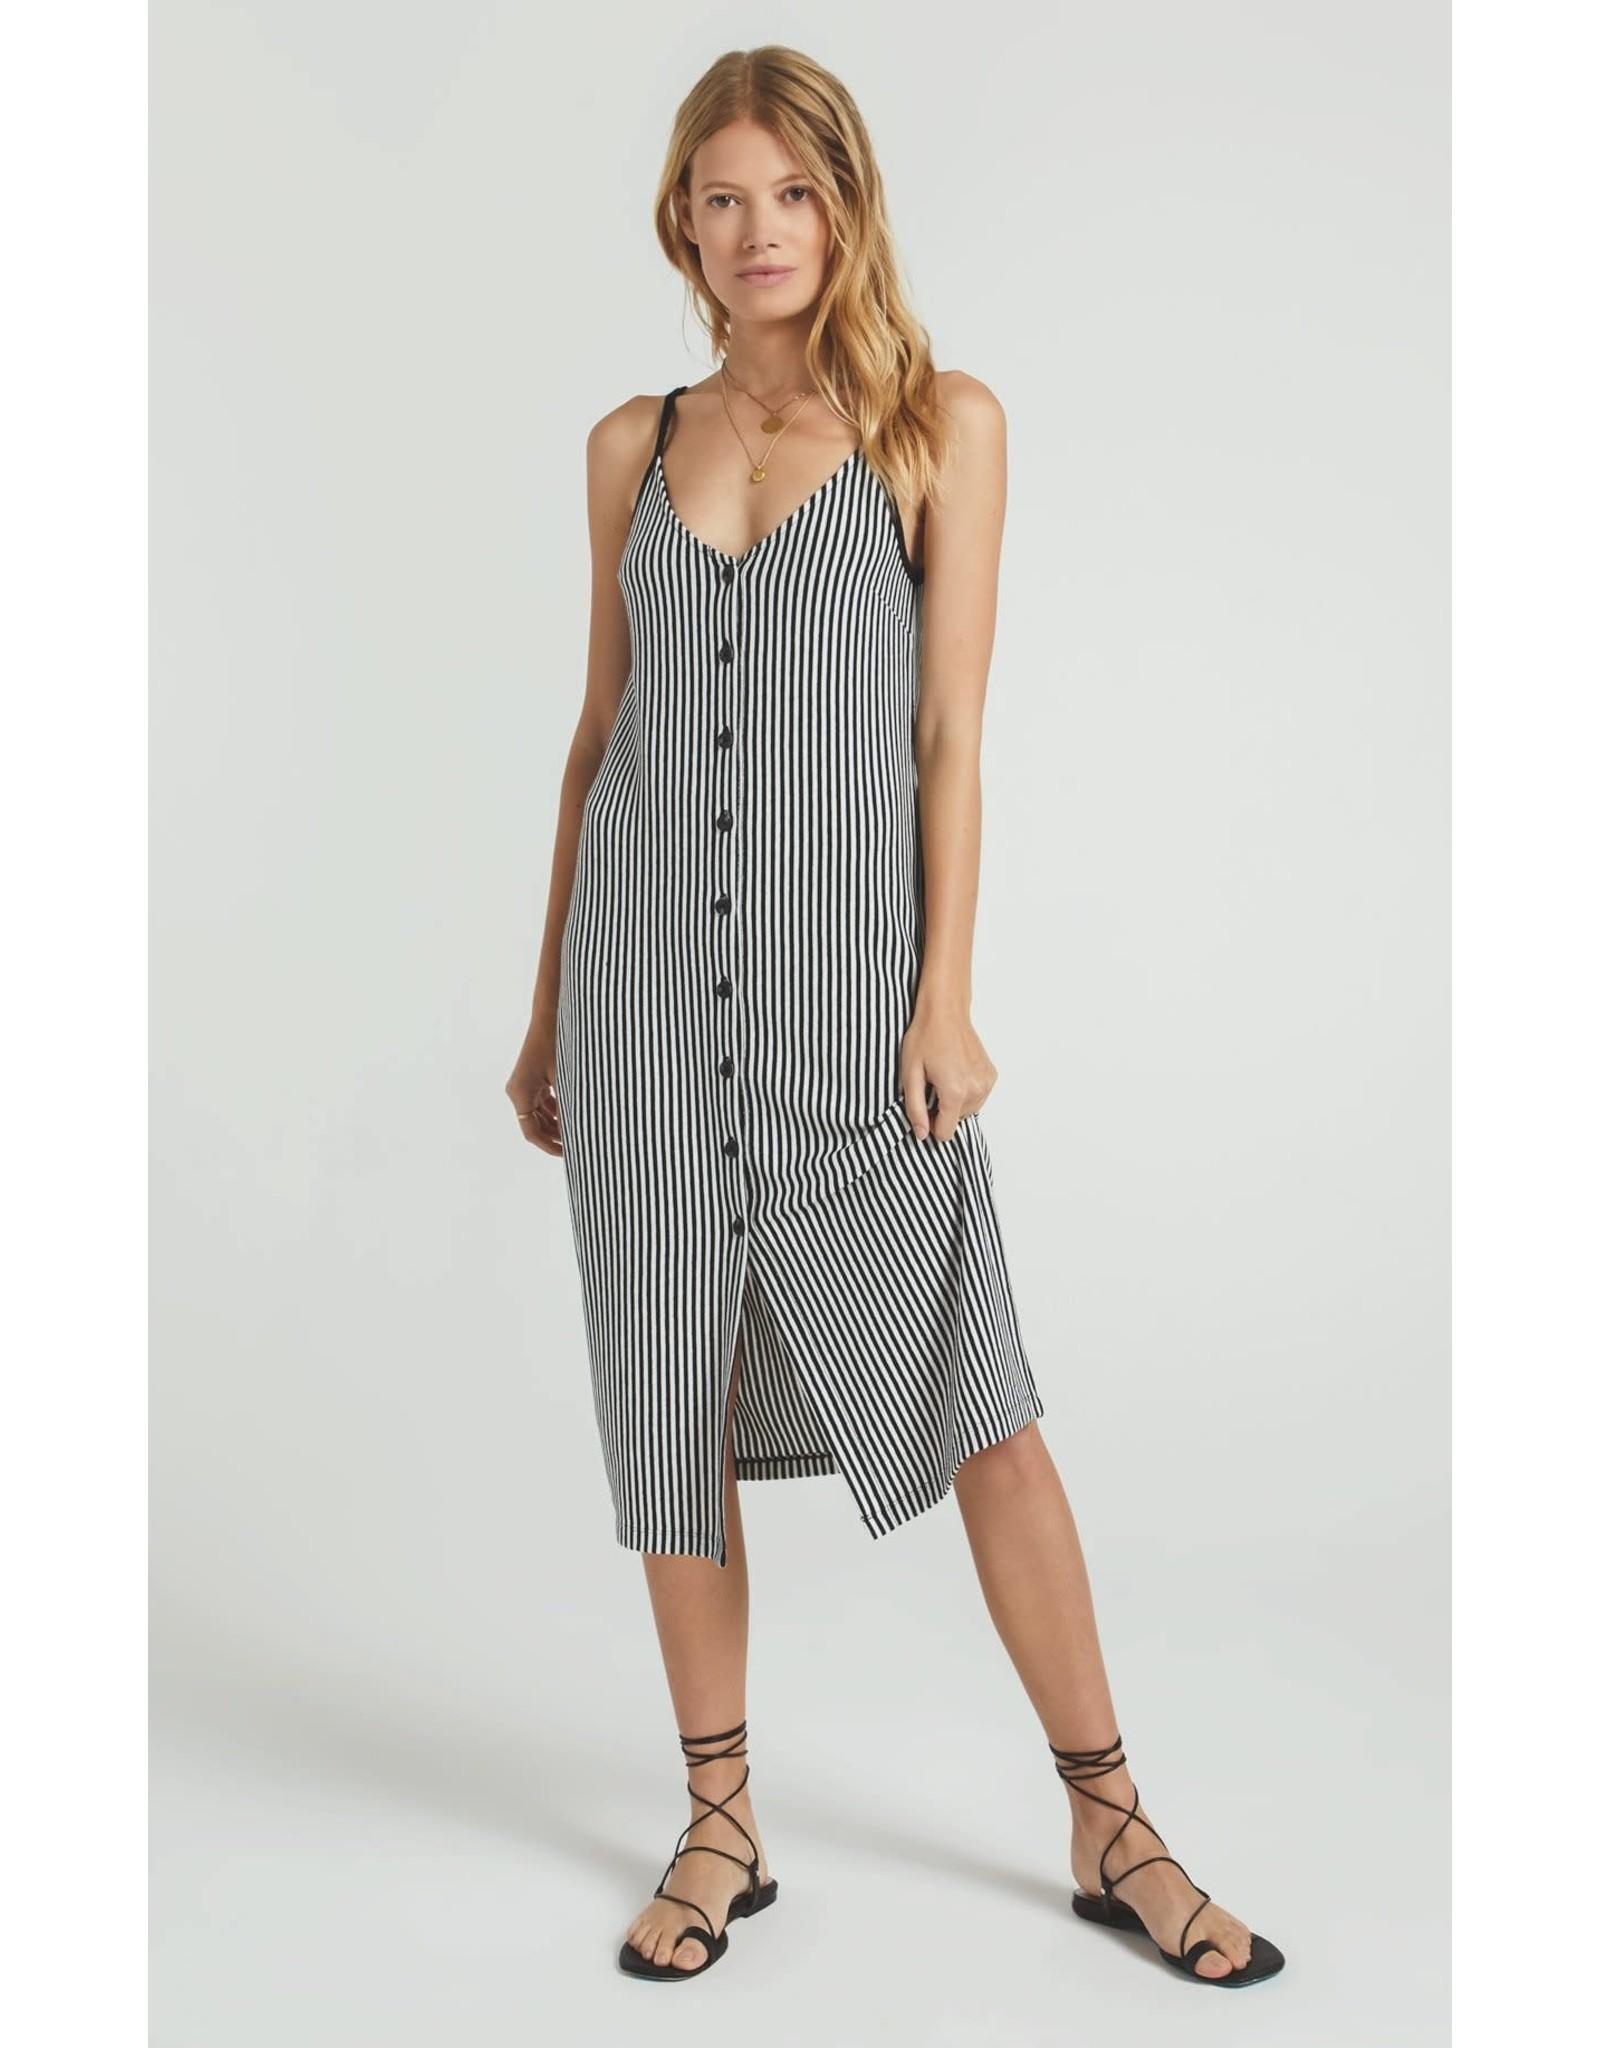 Z Supply Rosa Stripe Dress